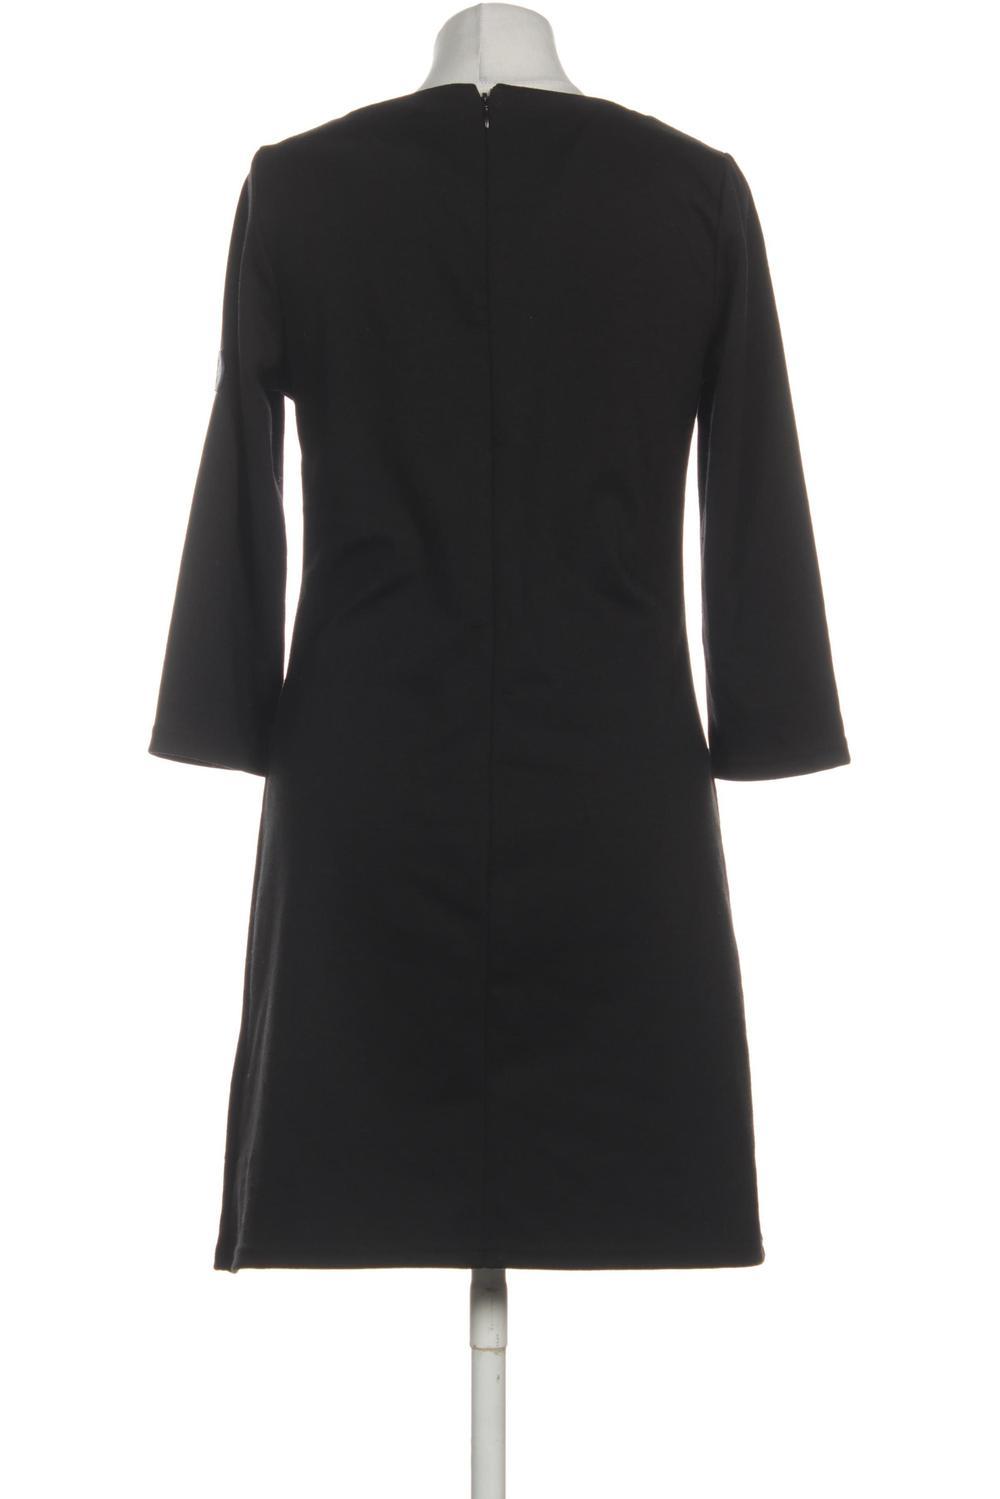 Tom Tailor Damen Kleid EUR 36 Second Hand kaufen   ubup